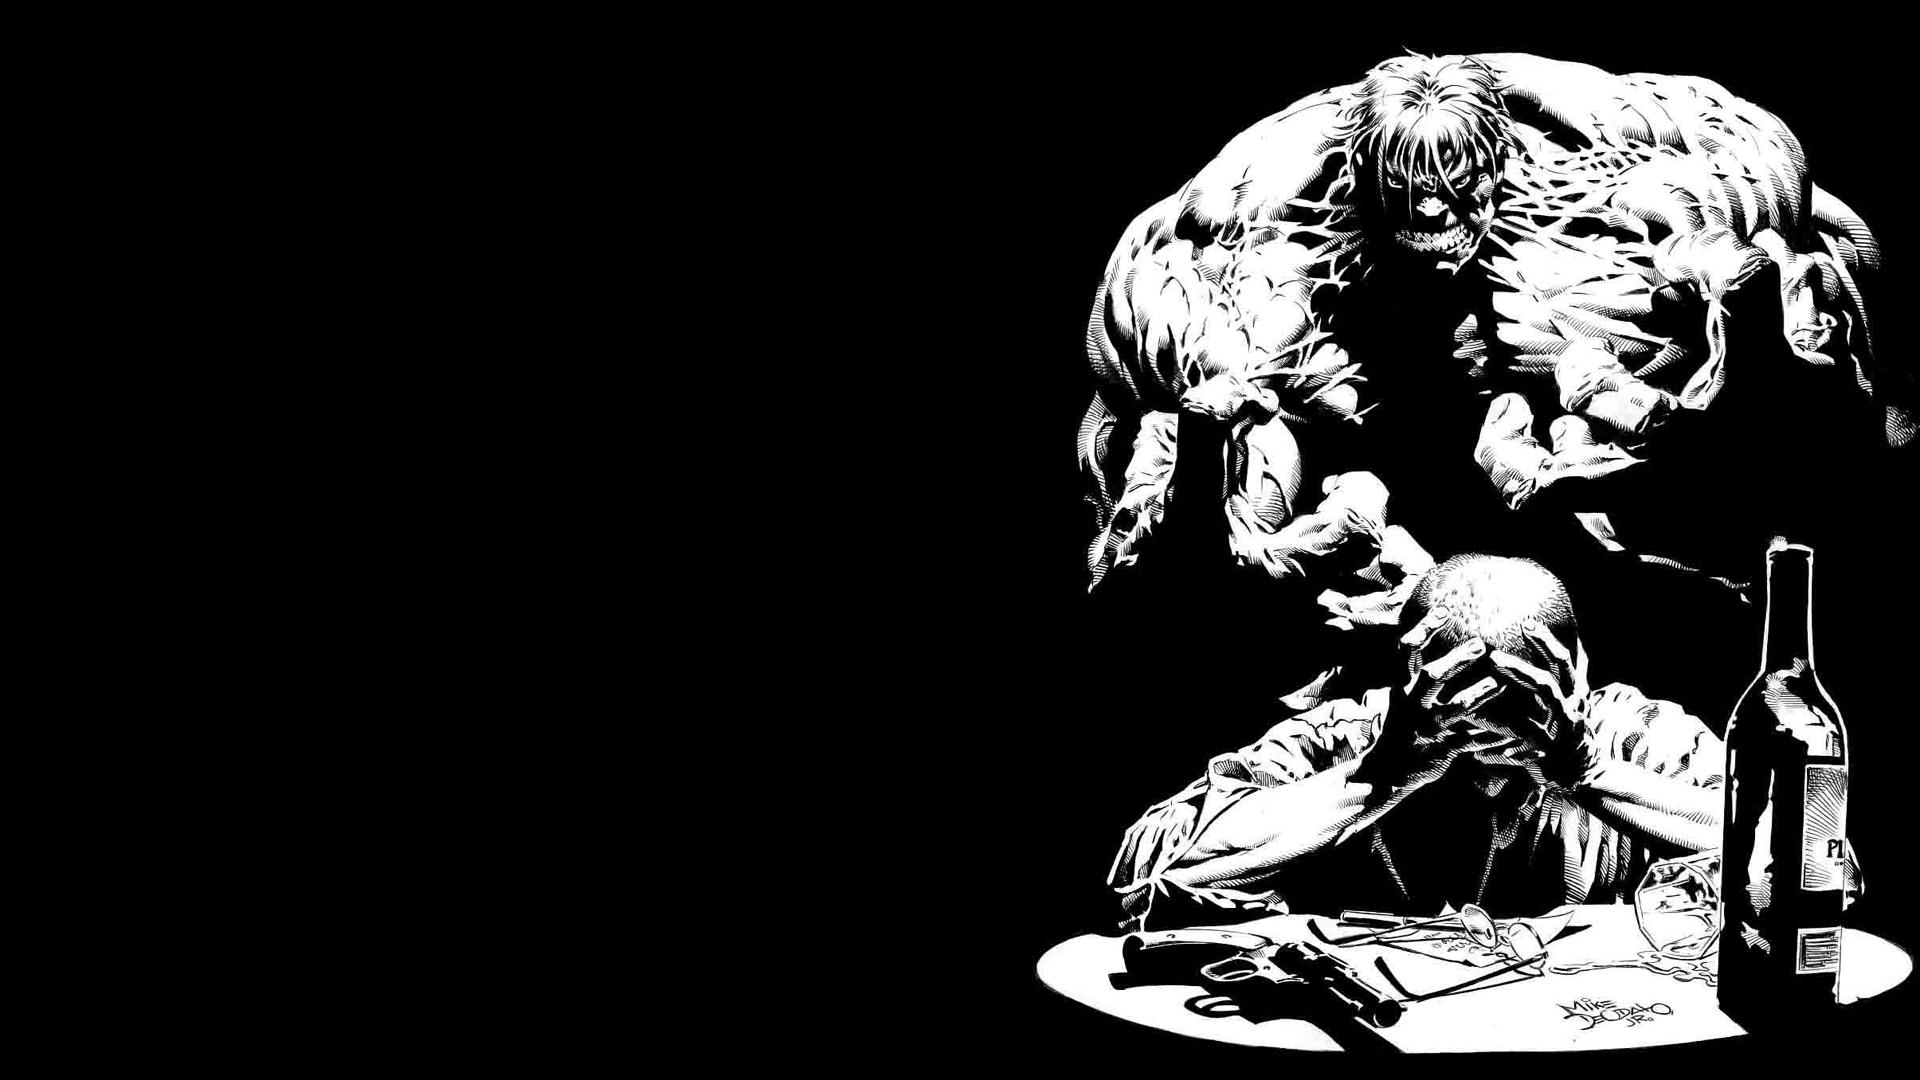 Hd wallpaper hulk - Comics Hulk Wallpaper